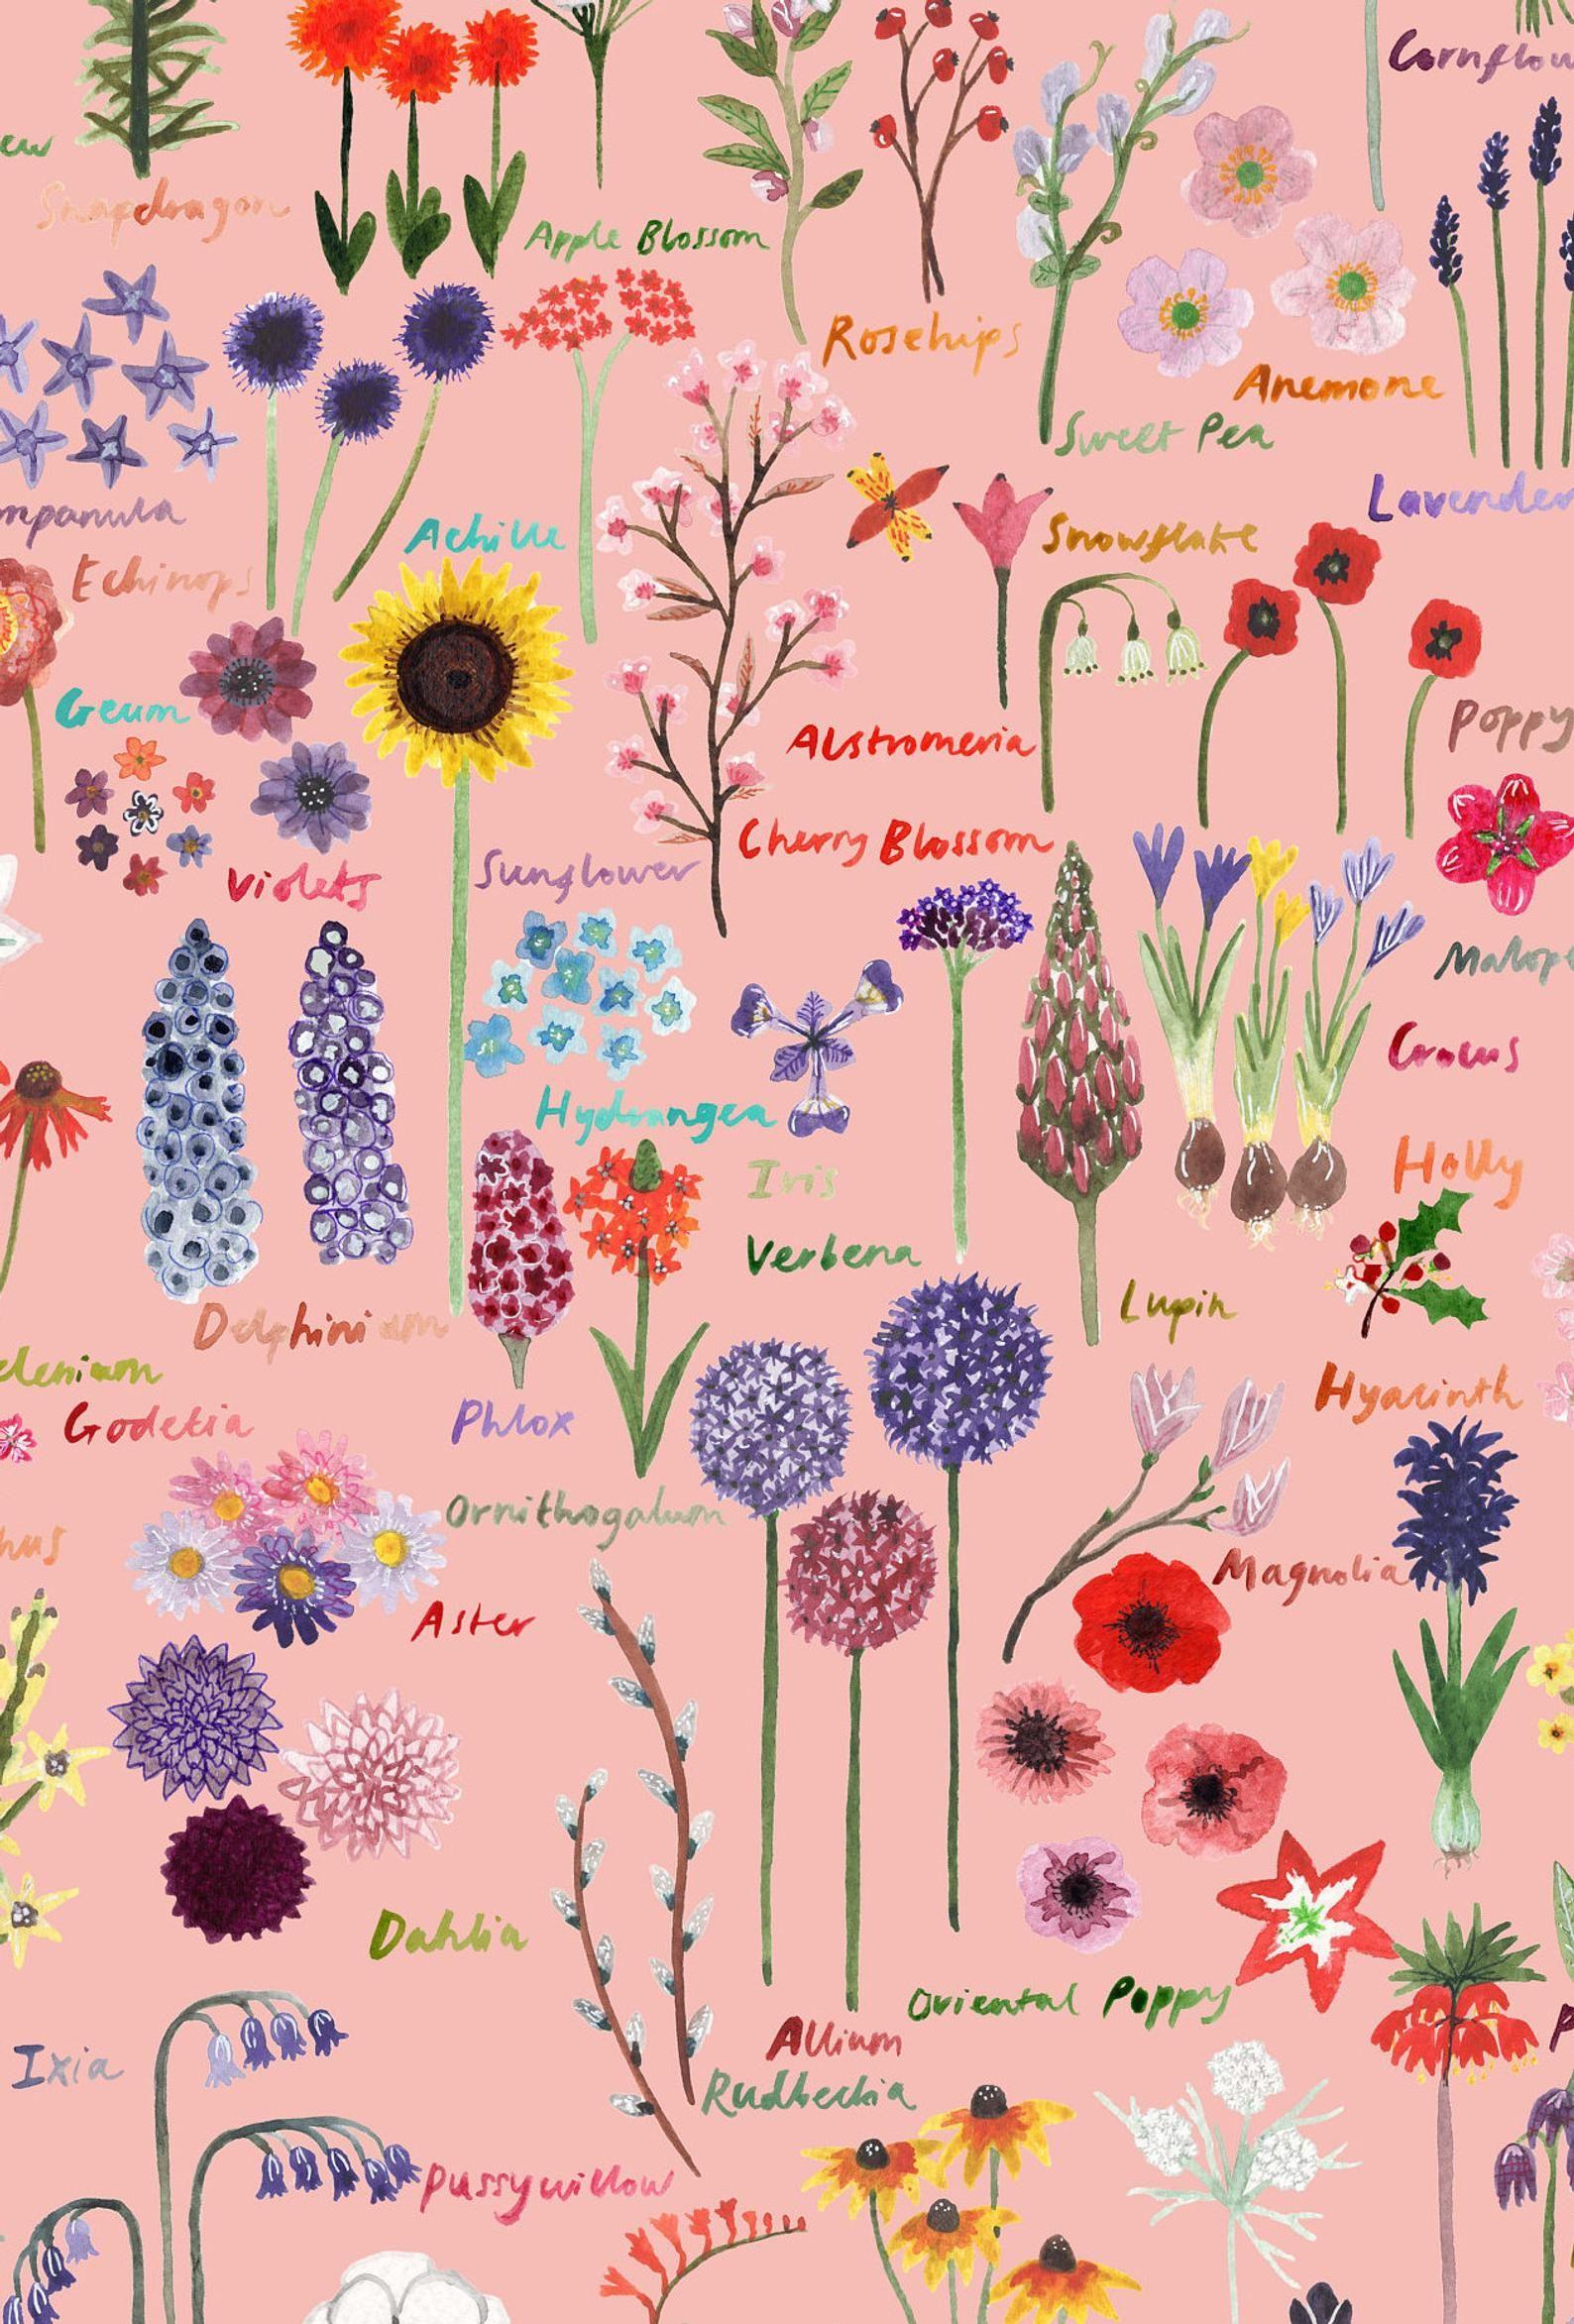 British Flowers Botanical Guide Art Print Pastel Pink Florals